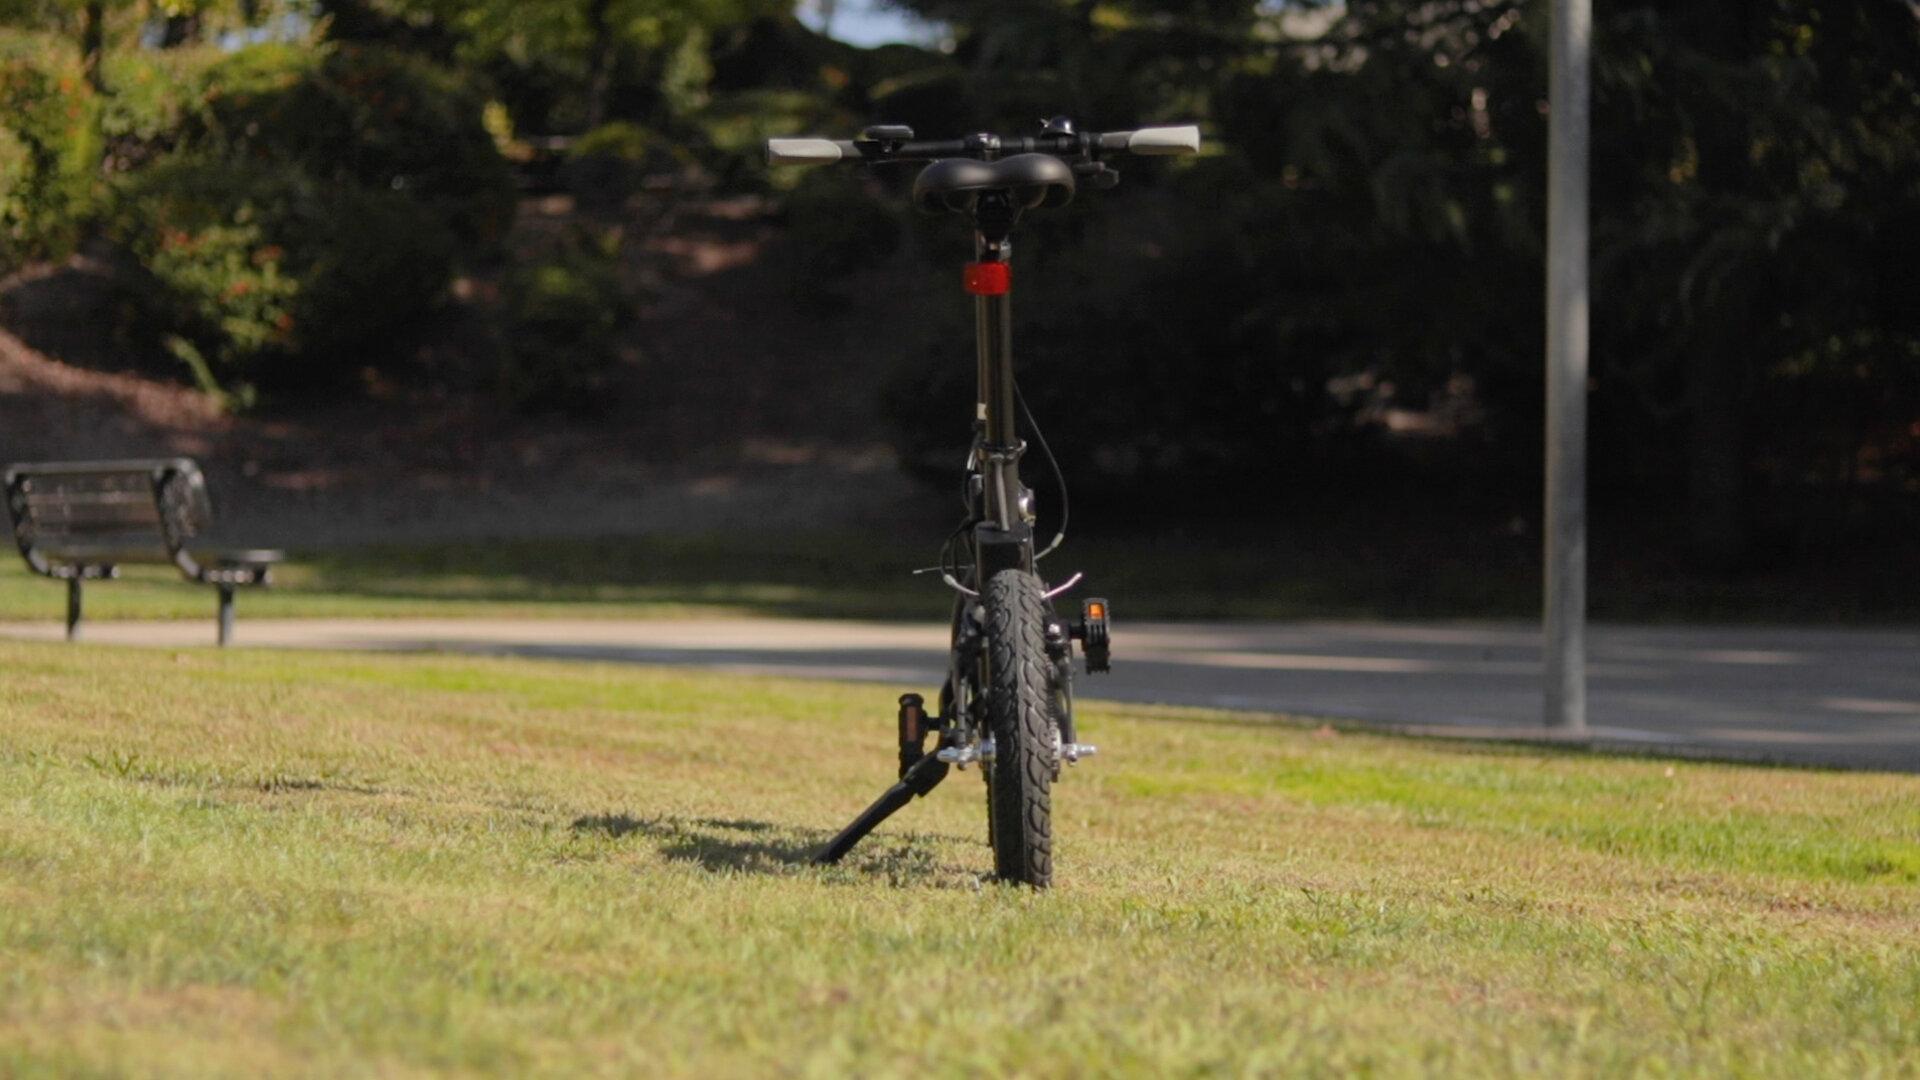 gotrax-shift-s1-electric-bike-review-2019-rear.jpg